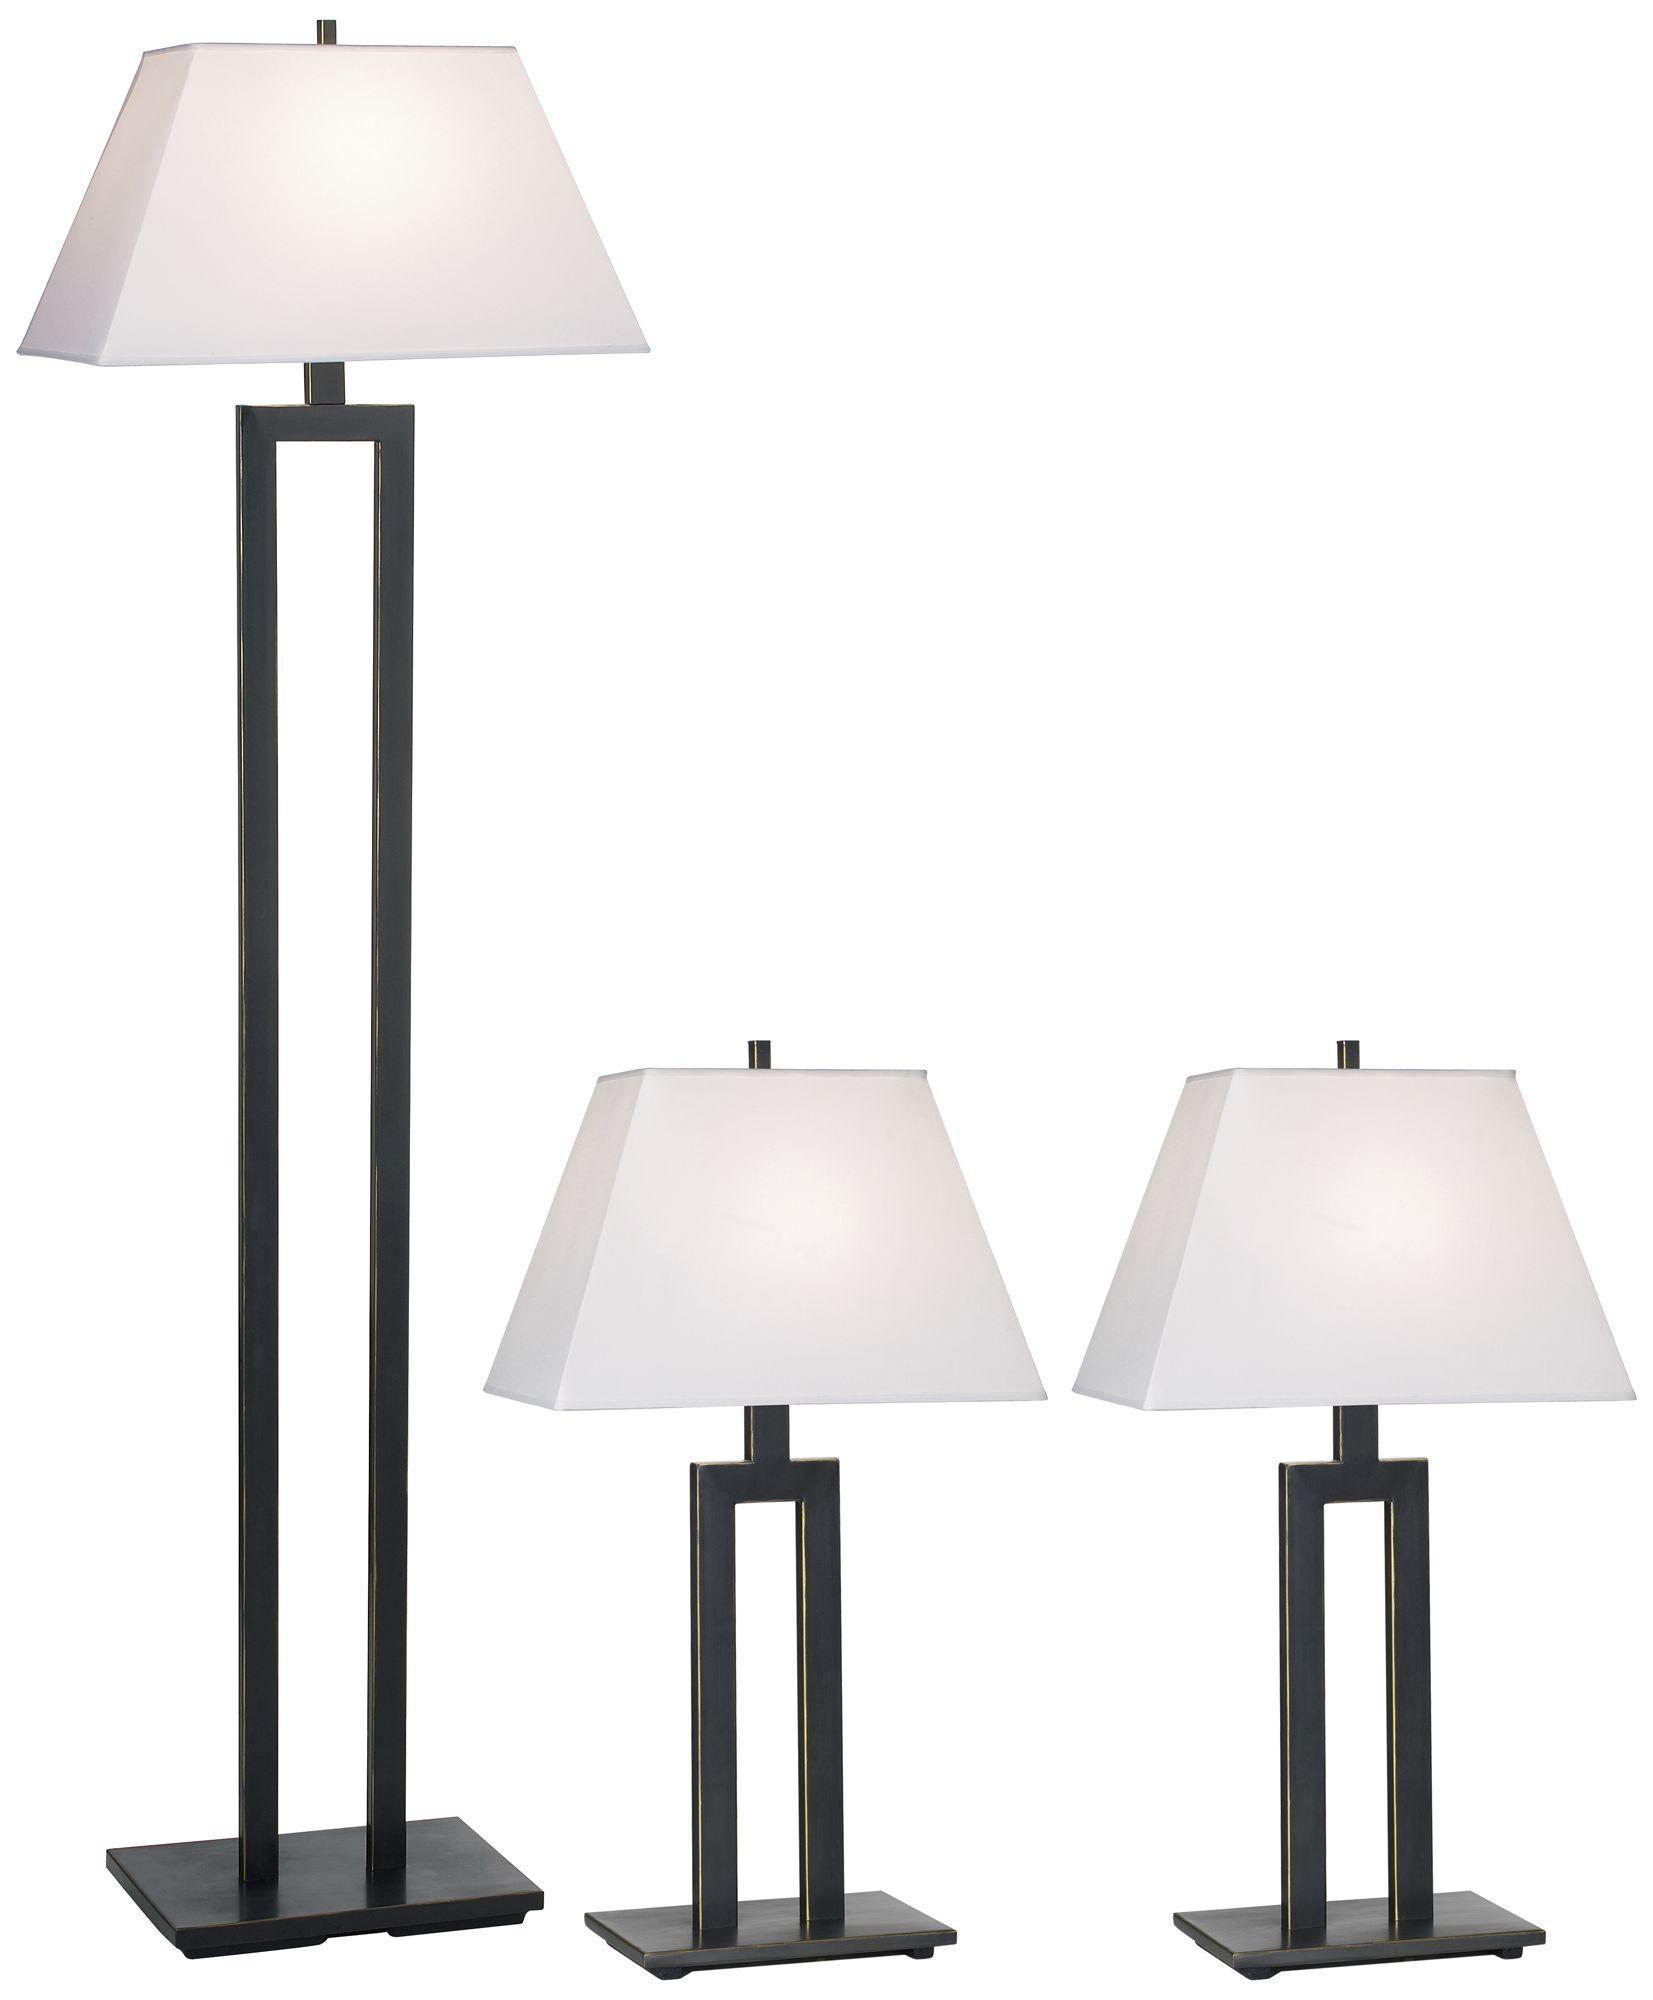 Contemporary Trio Table and Floor L& Set  sc 1 st  L&s Plus & Floor Lamp Sets - Matching Table \u0026 Floor Designs | Lamps Plus